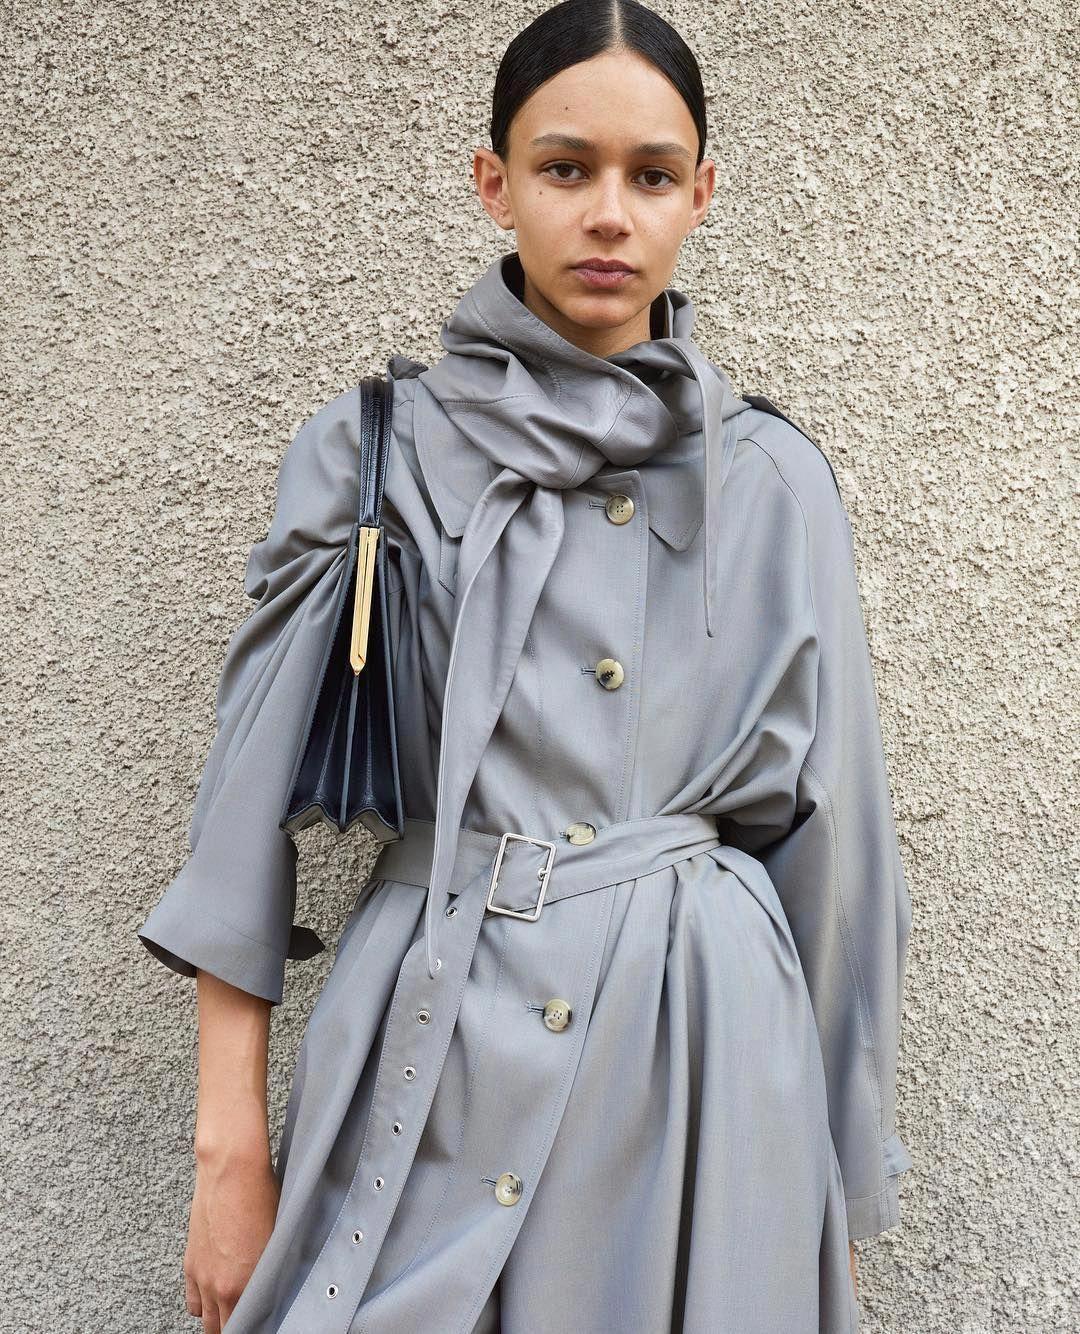 Winter 17 Campaign Photography by  JuergenTeller  CelineWinter17  celine   Designerhandbags f1669cb80fd4c